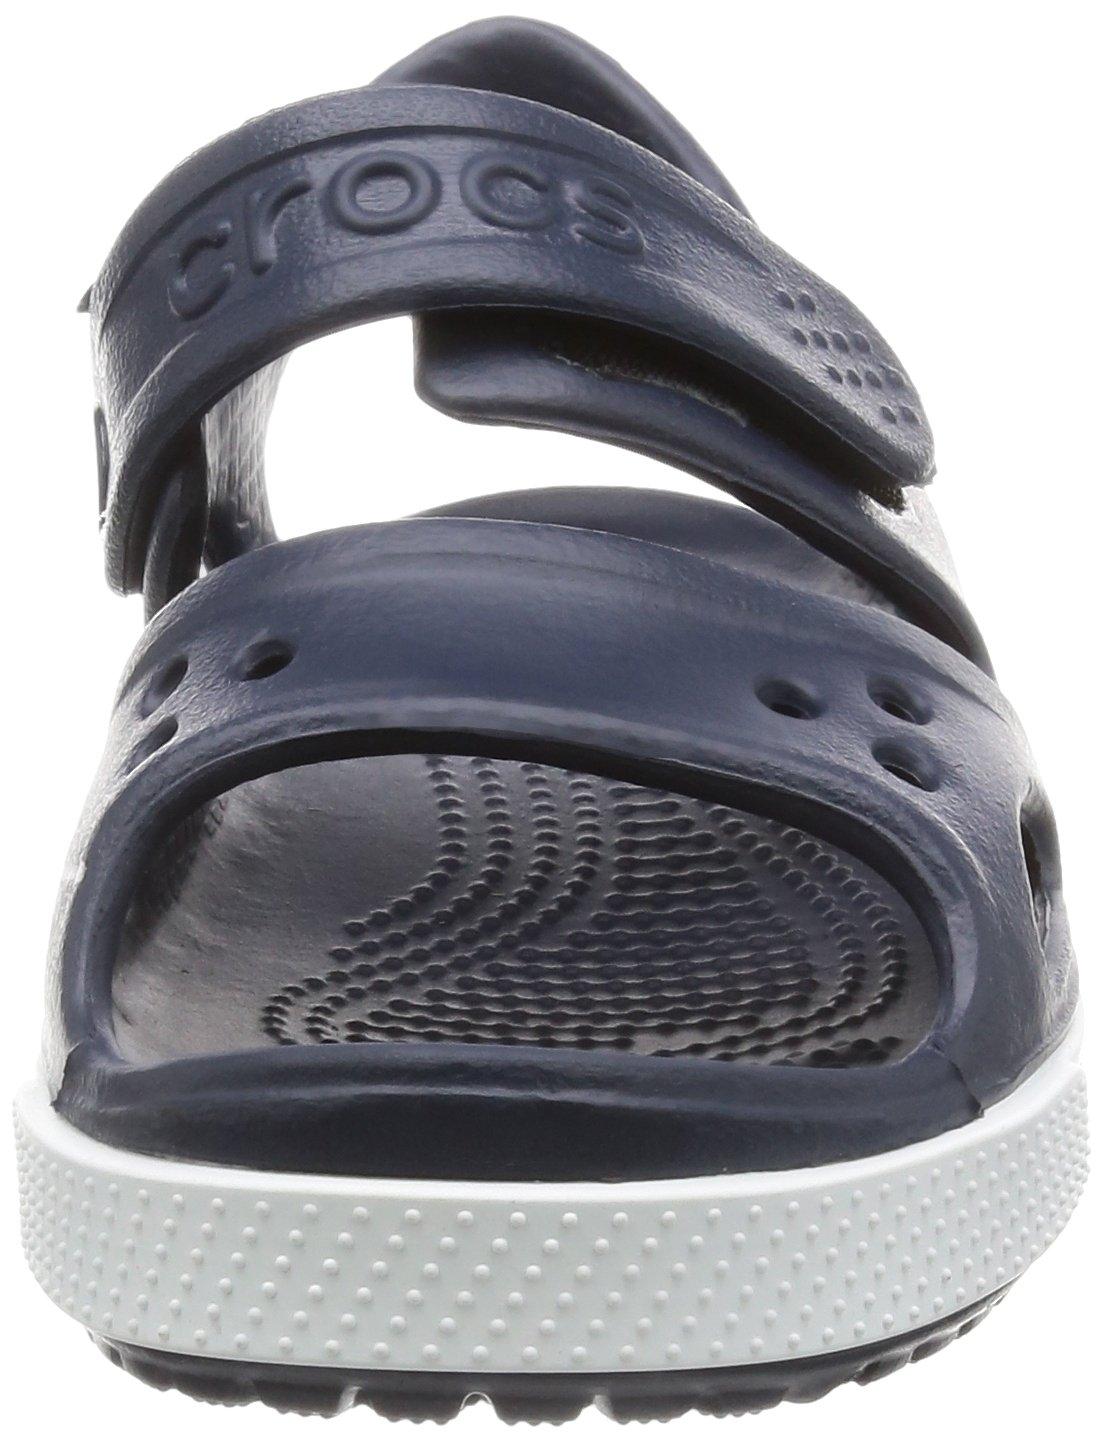 Crocs Kid's Boys and Girls Crocband II Sandal | Pre School, Navy/White, 5 M US Toddler by Crocs (Image #4)